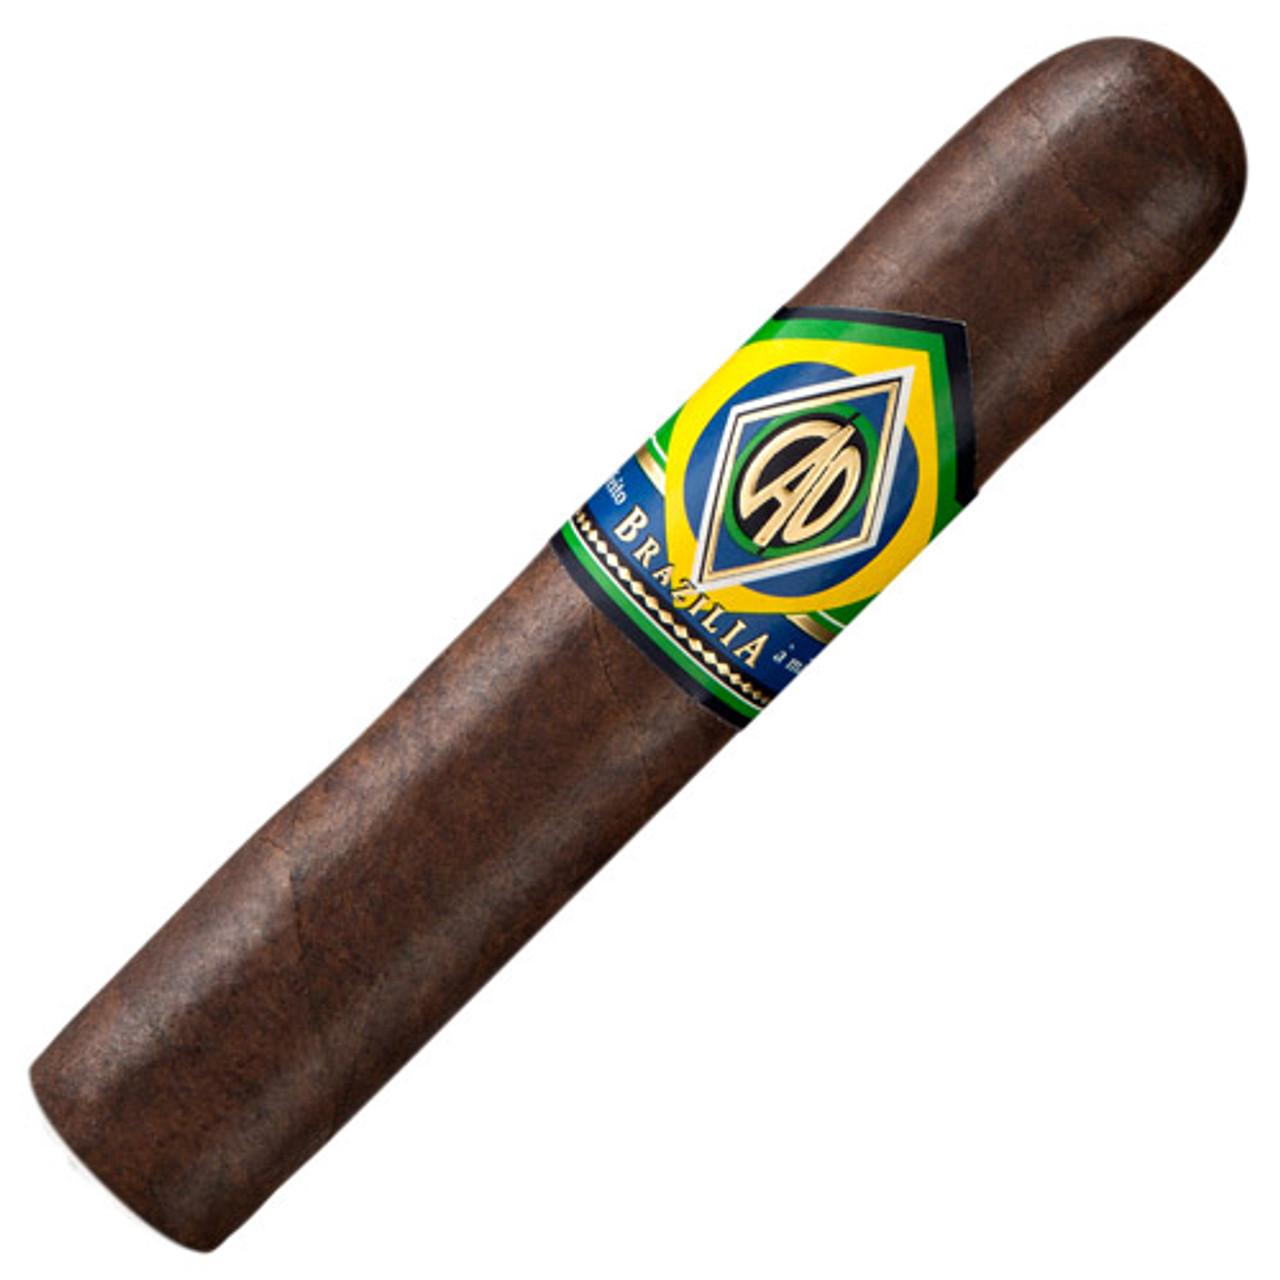 CAO Brazilia Gol Cigars - 5 x 56 (Box of 20)